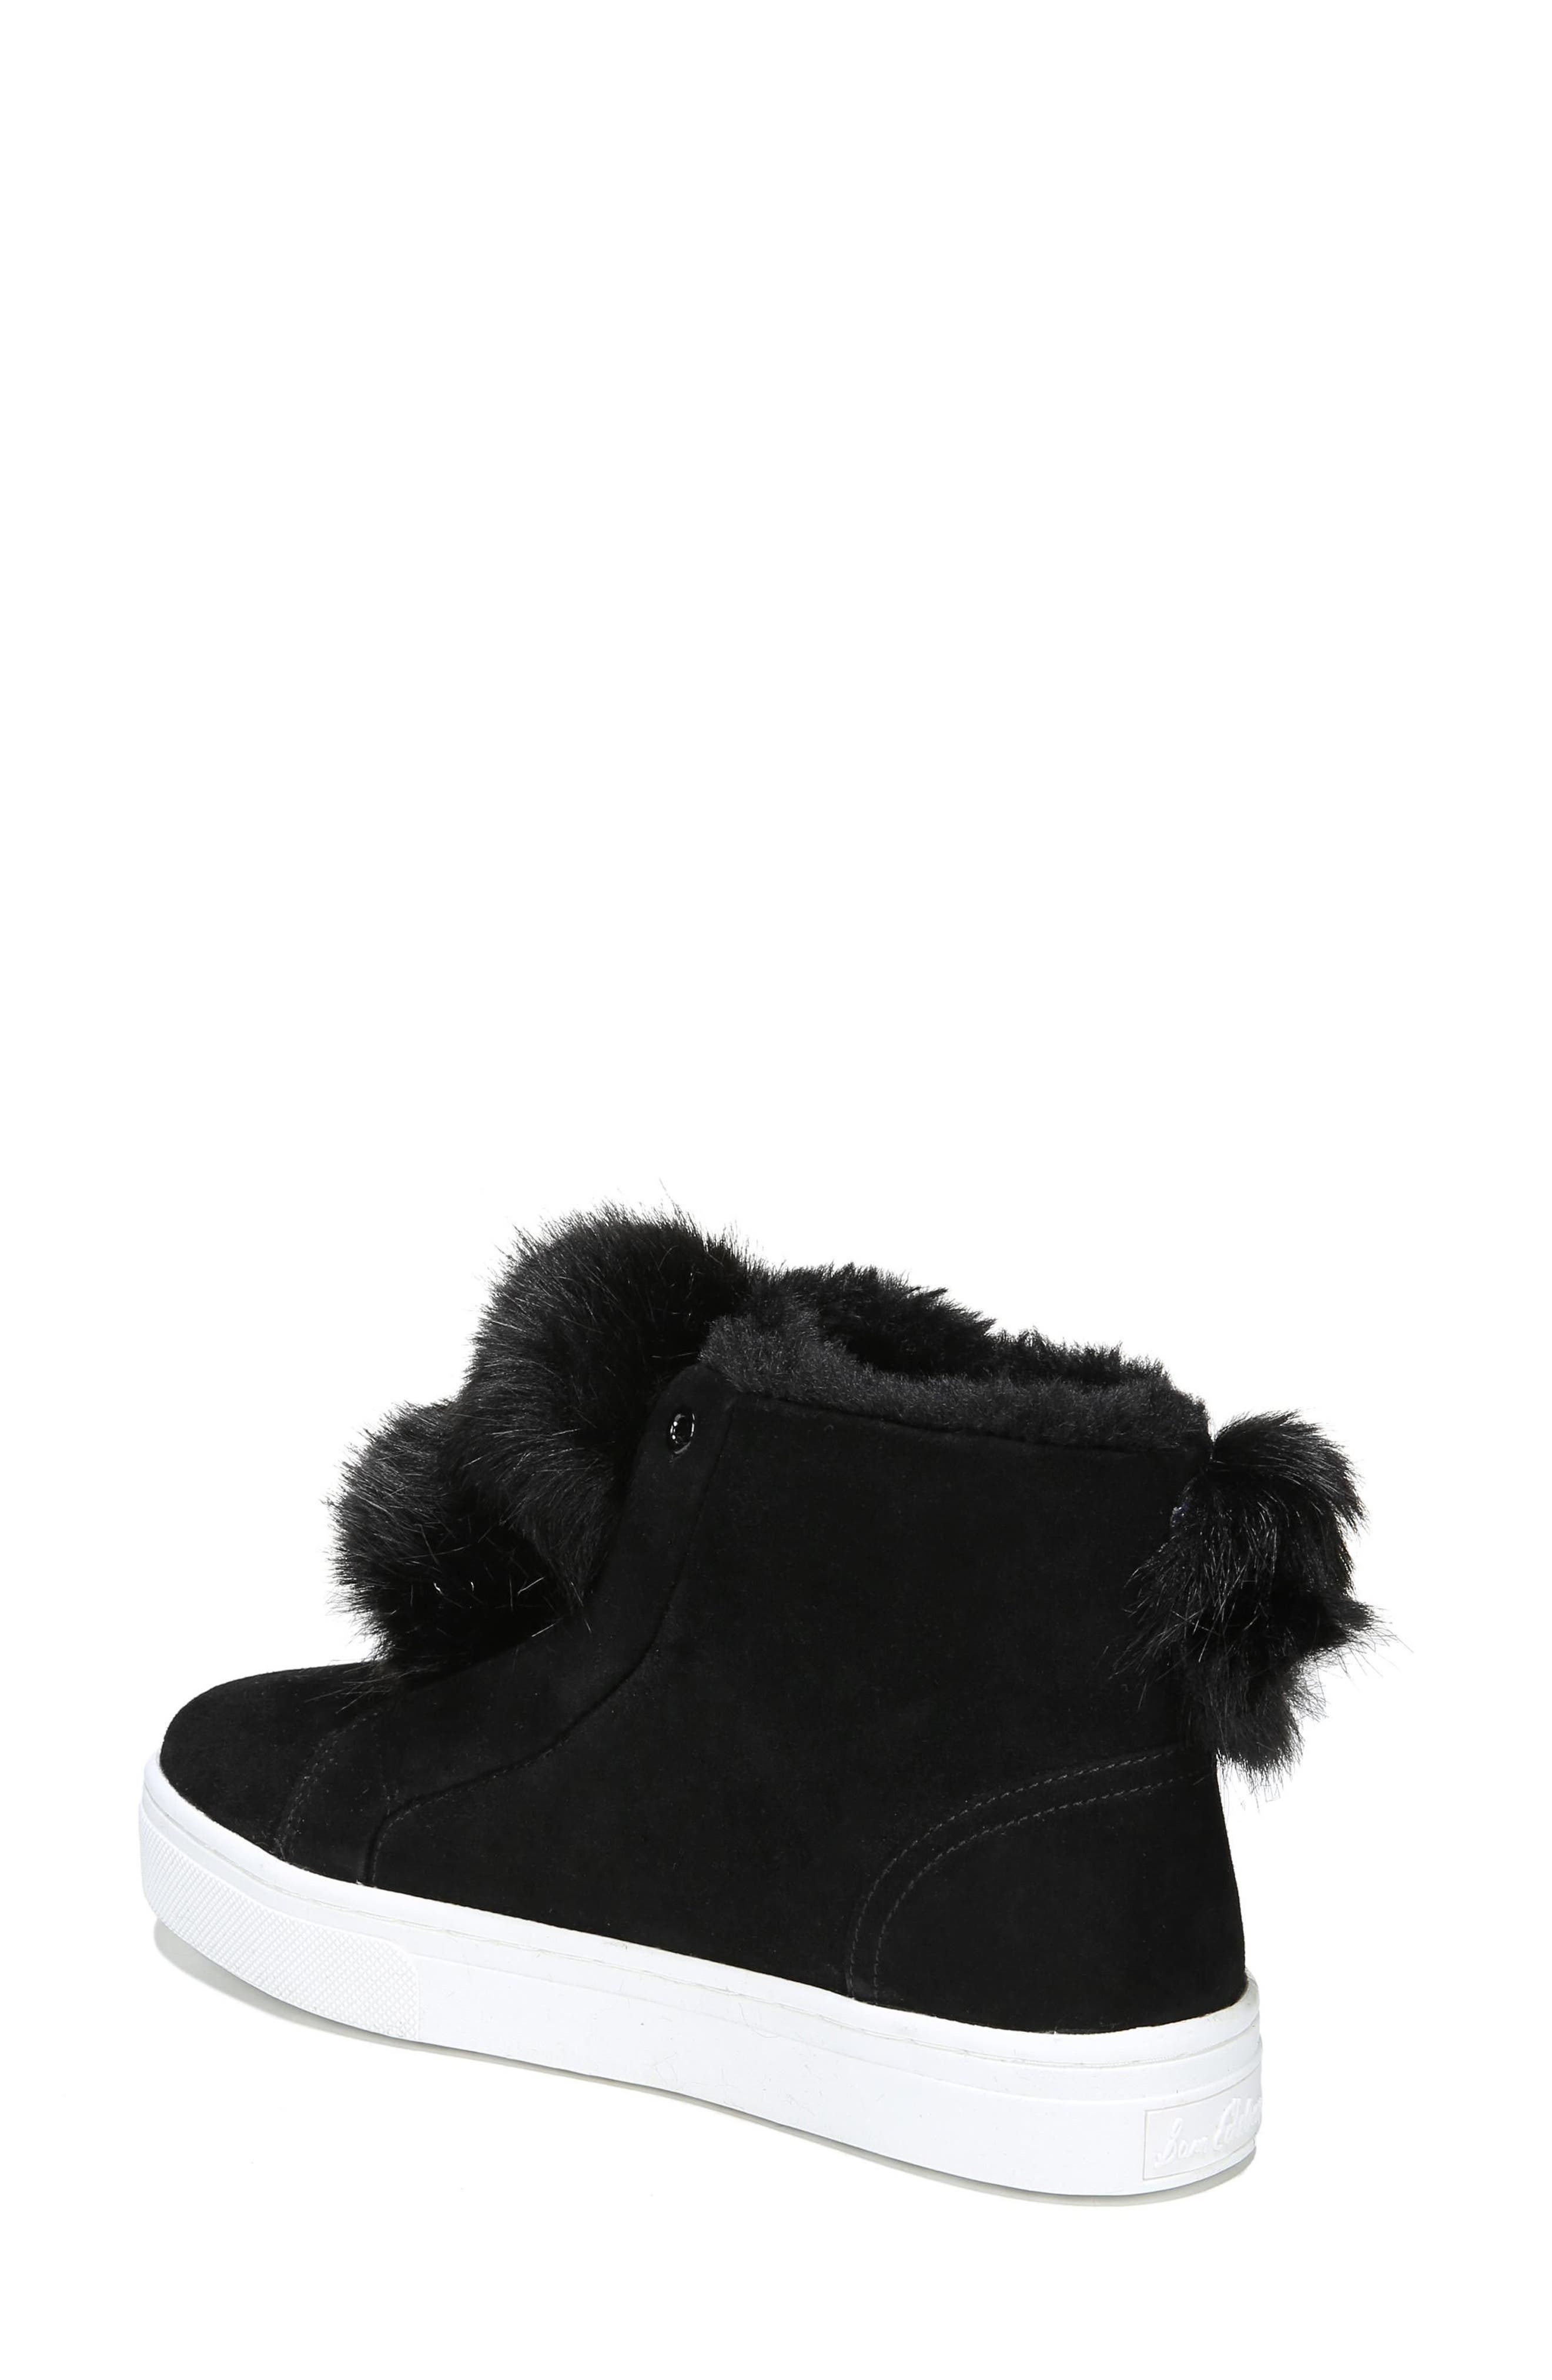 Lear Faux Fur Sneaker,                             Alternate thumbnail 2, color,                             001